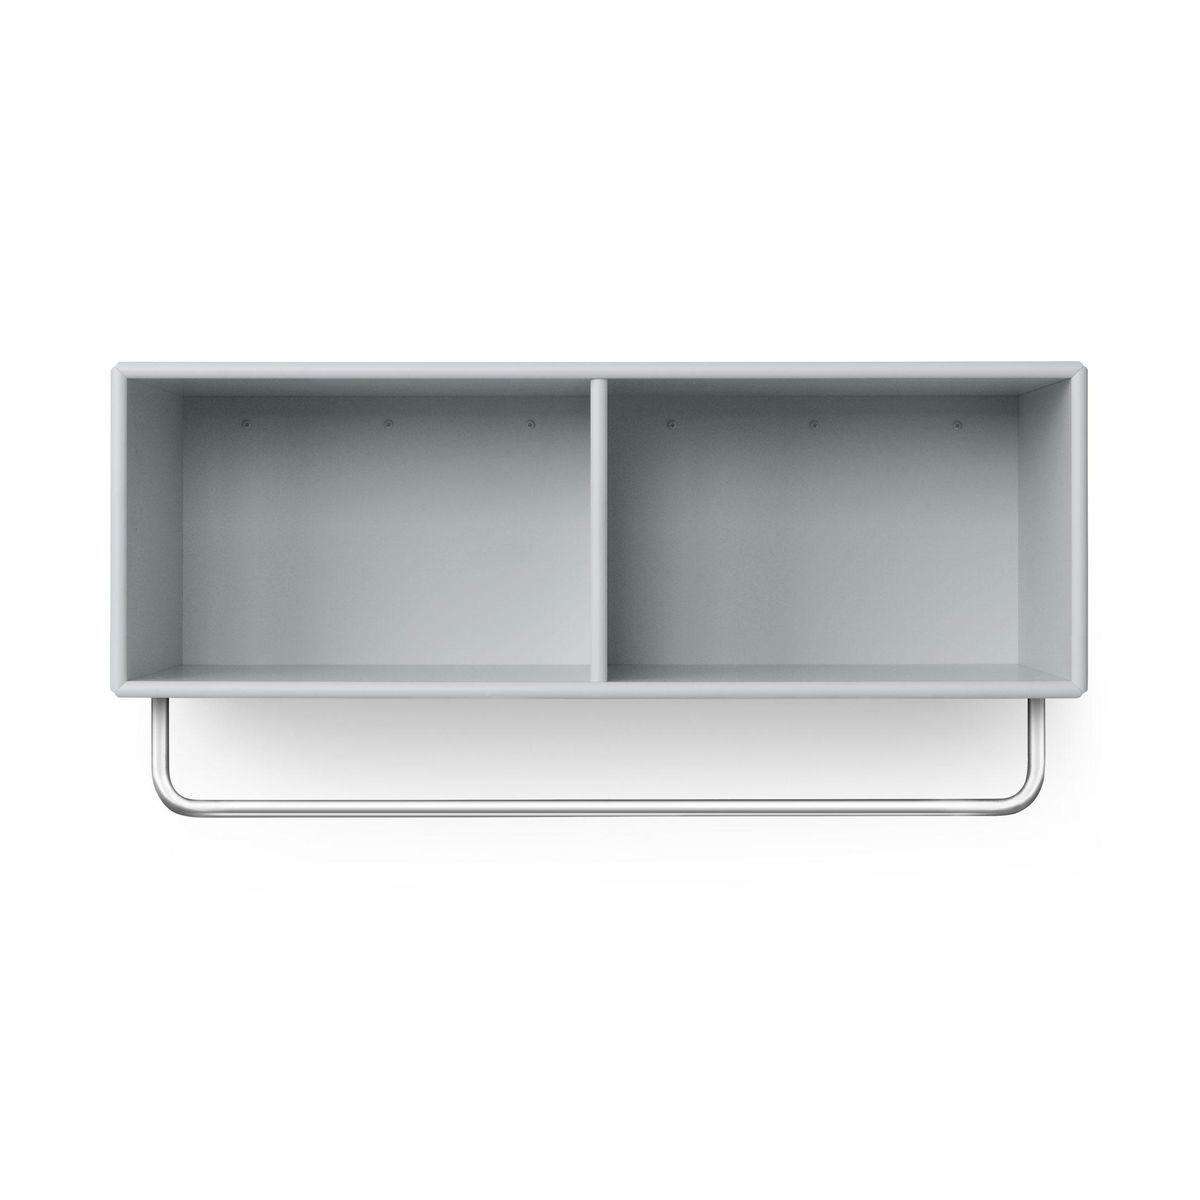 coat coat rack 69 6x24x30cm montana. Black Bedroom Furniture Sets. Home Design Ideas